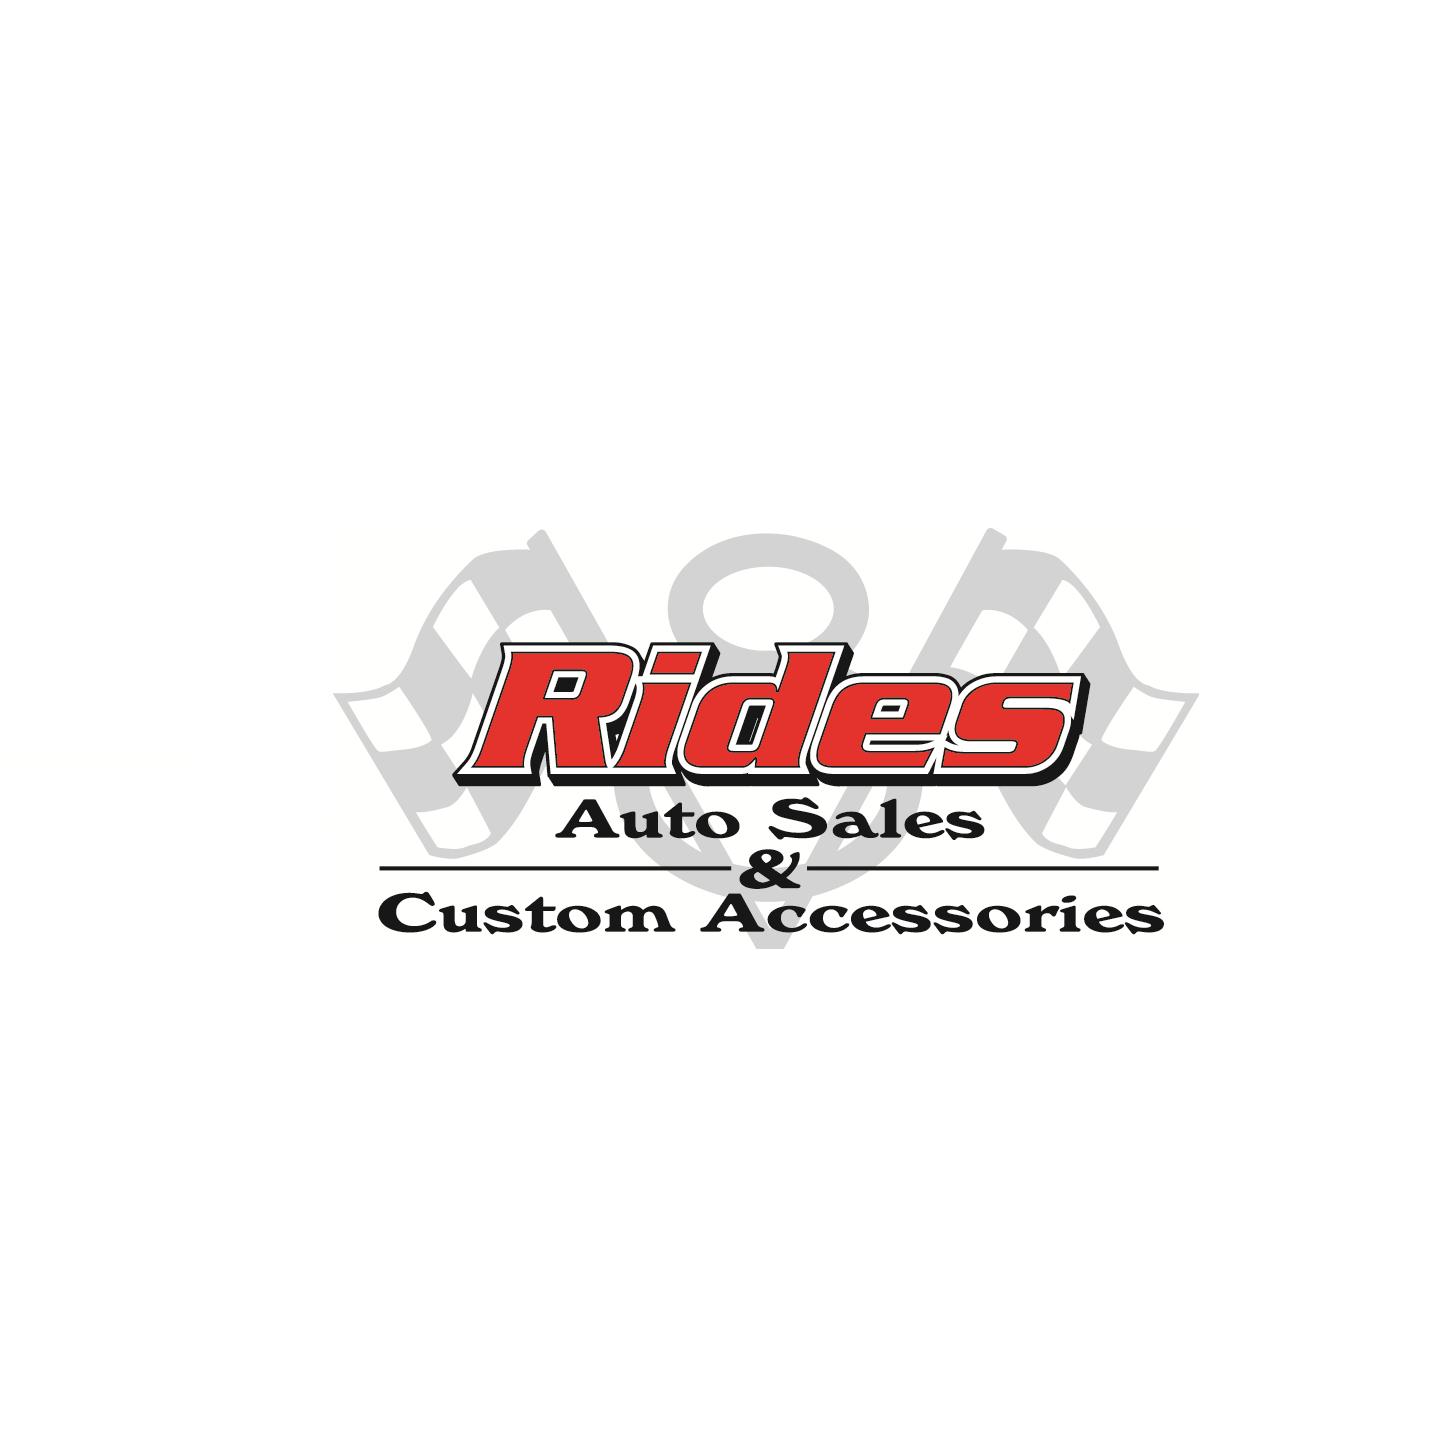 Classic Car Sales North Dakota